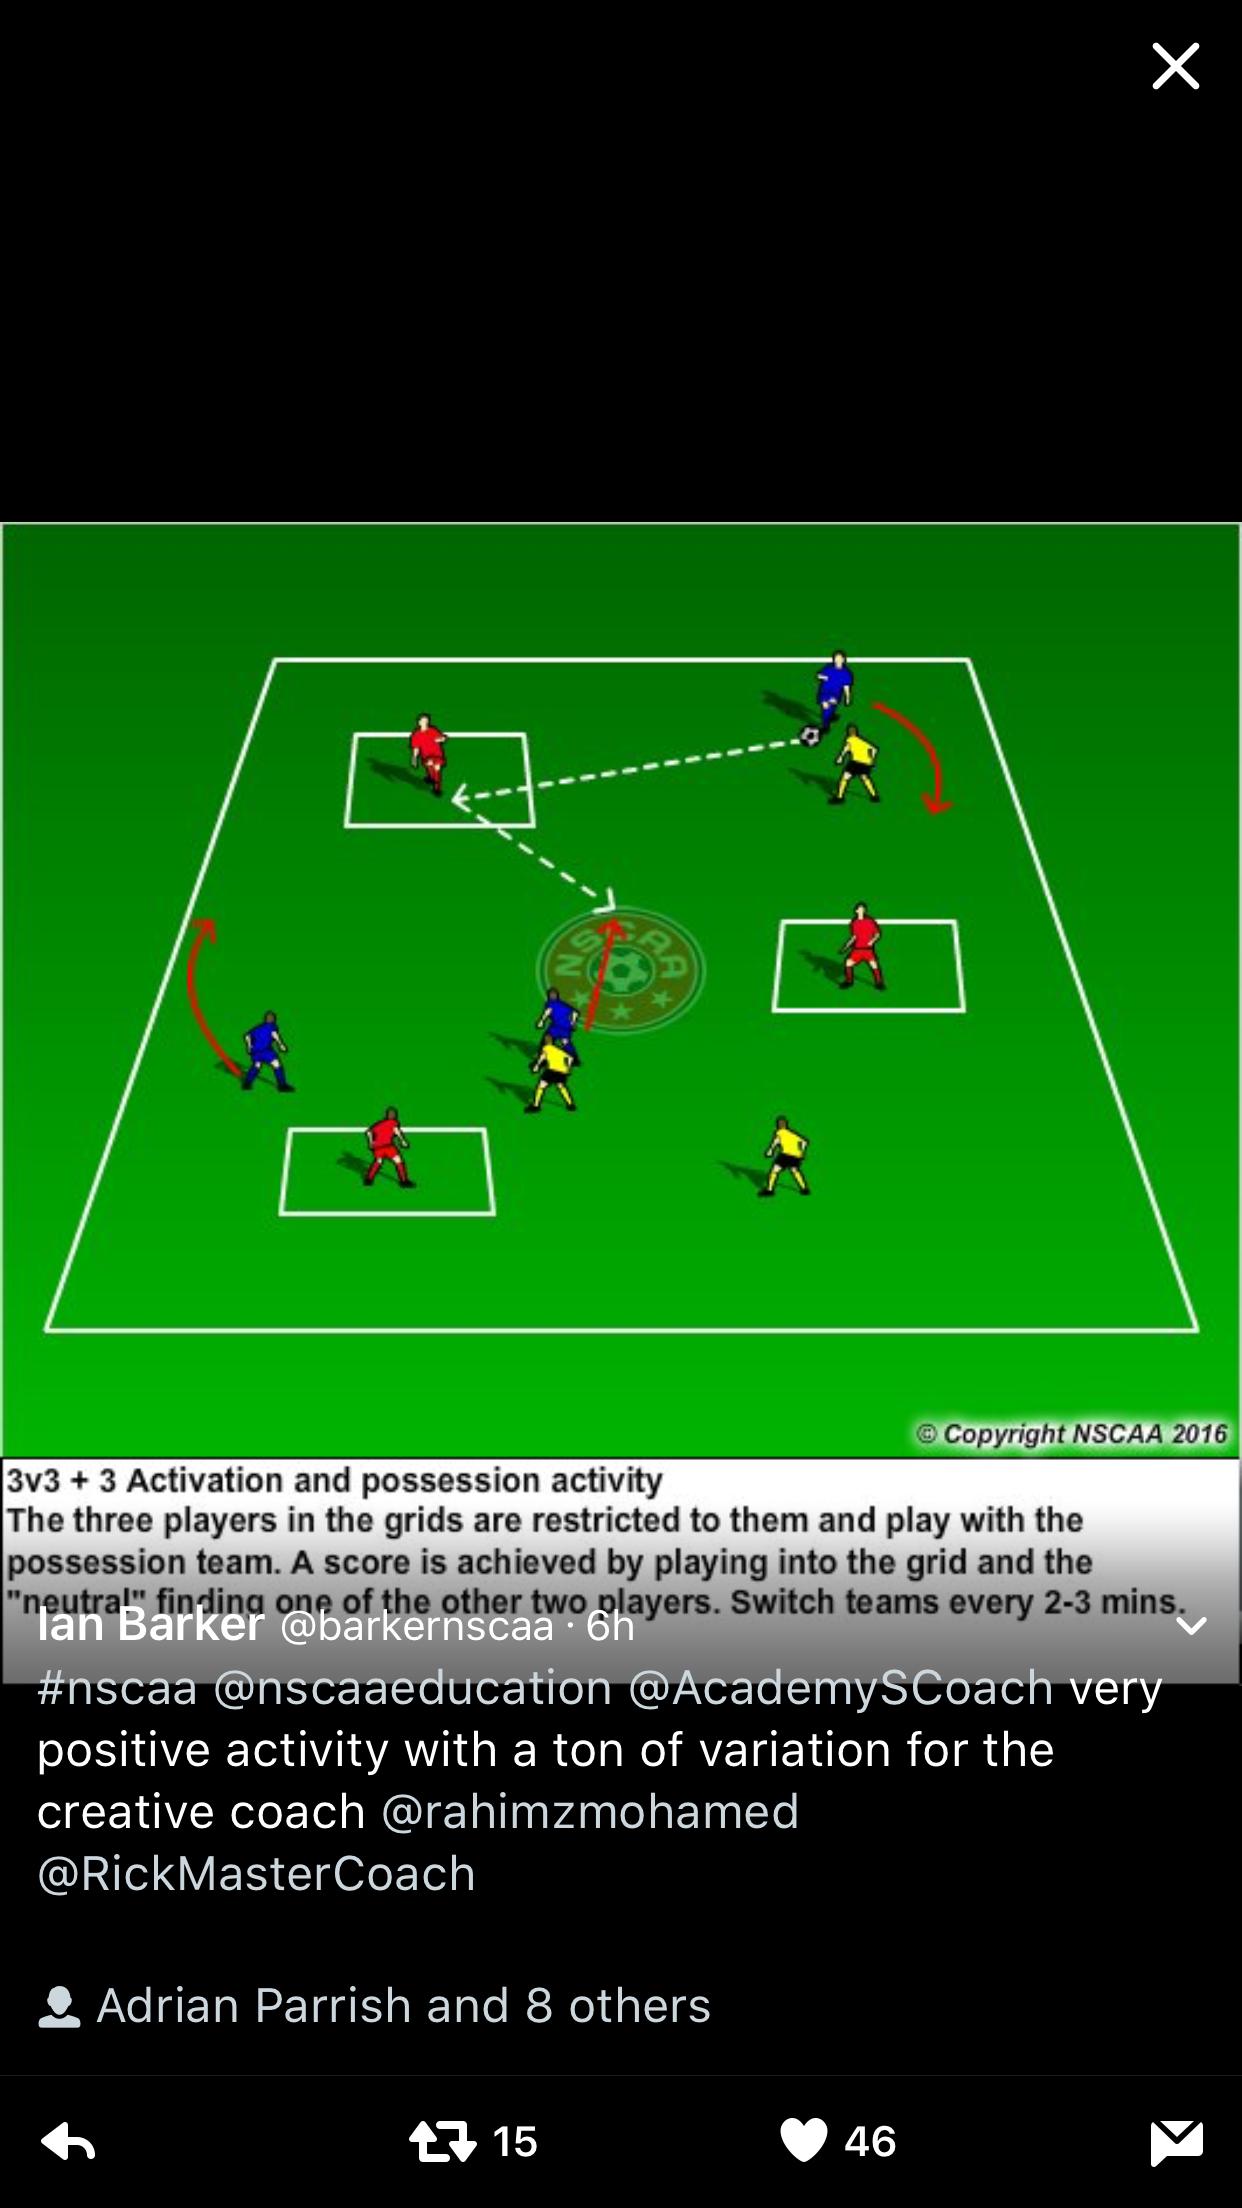 Pin By Alan Davidson On Soccer Drills Soccer Drills Soccer Drills For Kids Soccer